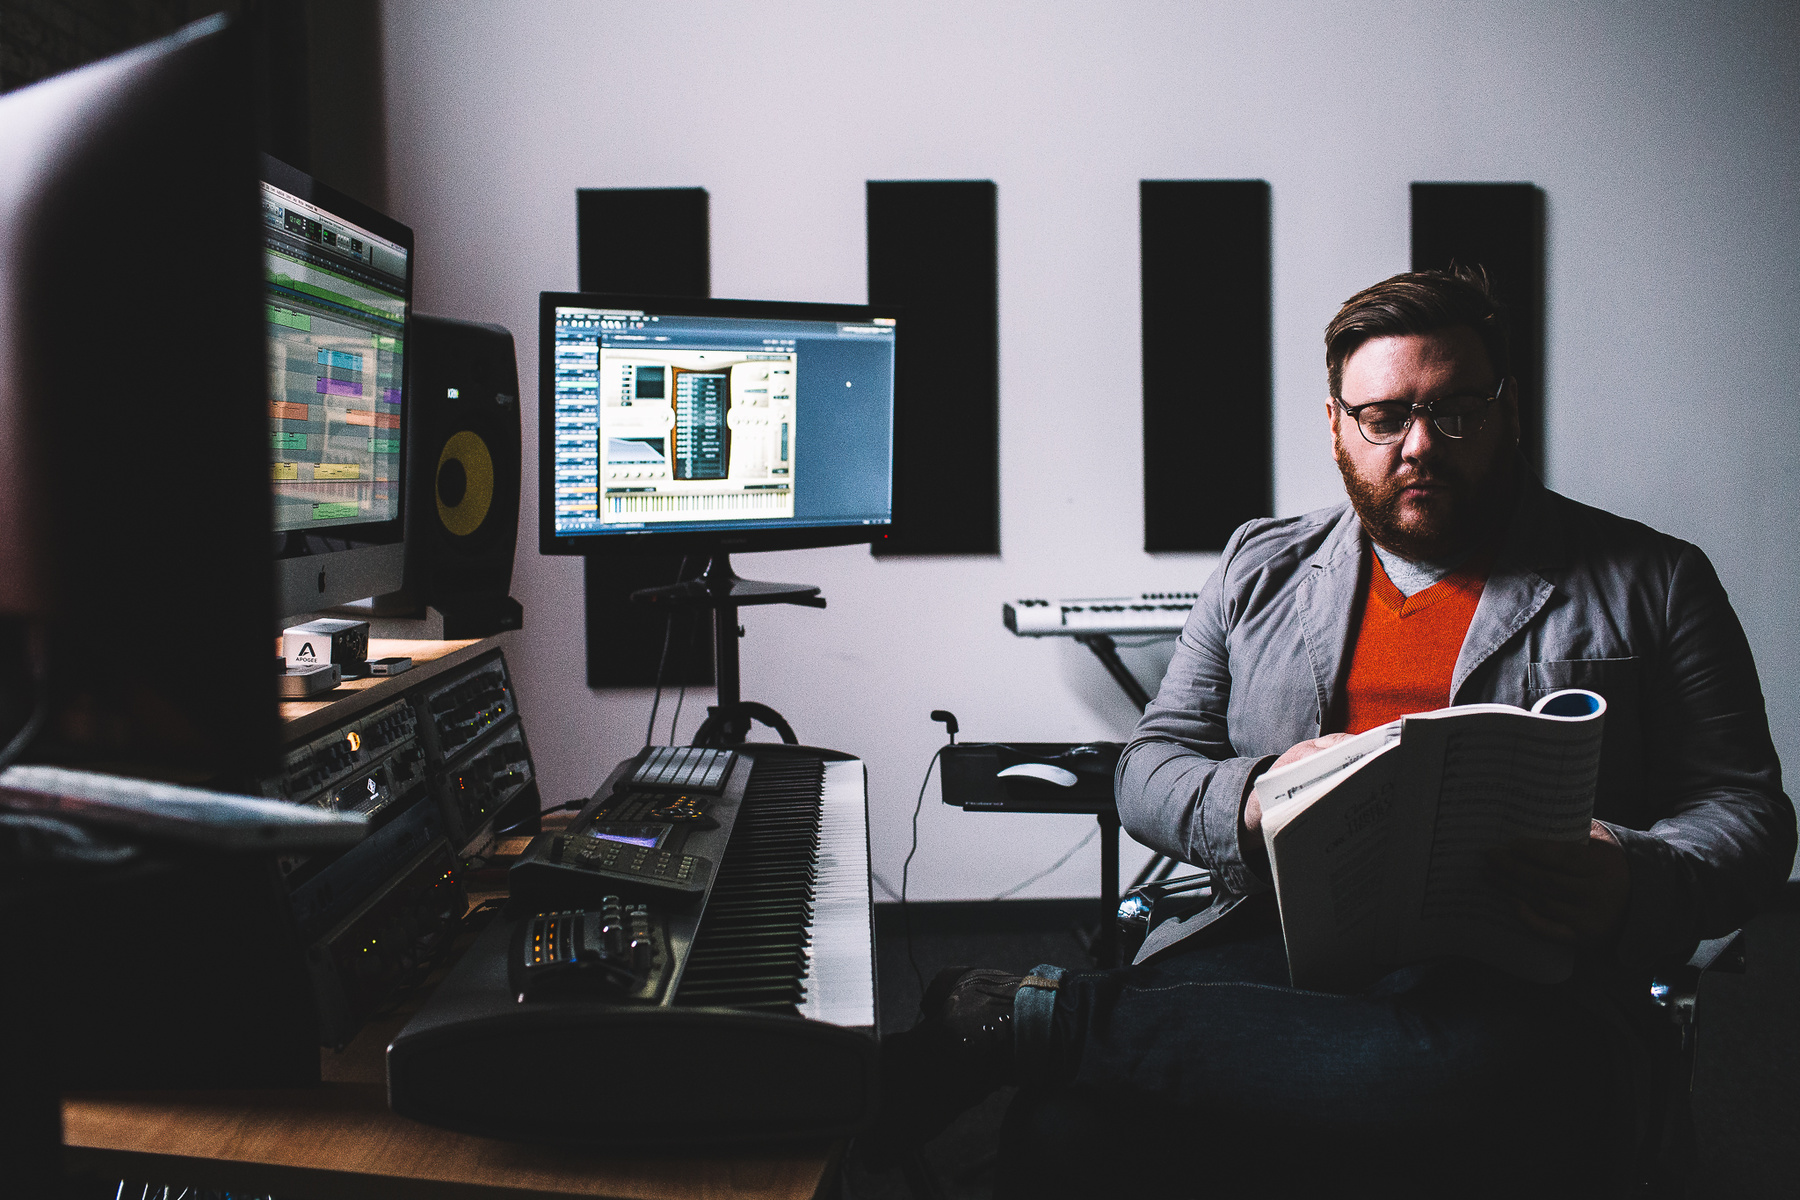 neosonic-productions-david-decker.jpg